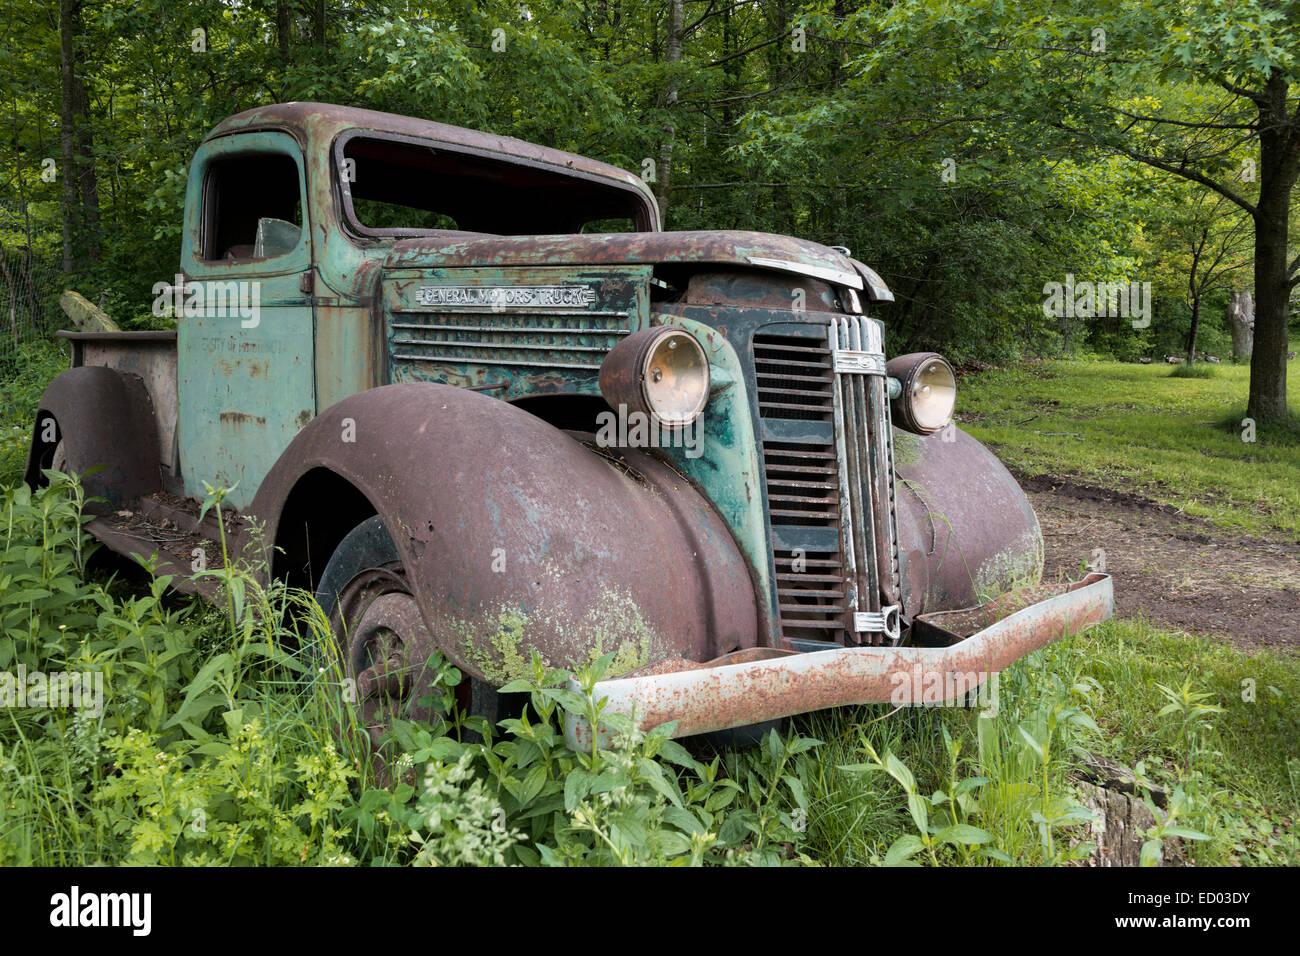 Old rusted General Motors truck, near Sandstone, Minnesota, USA - Stock Image